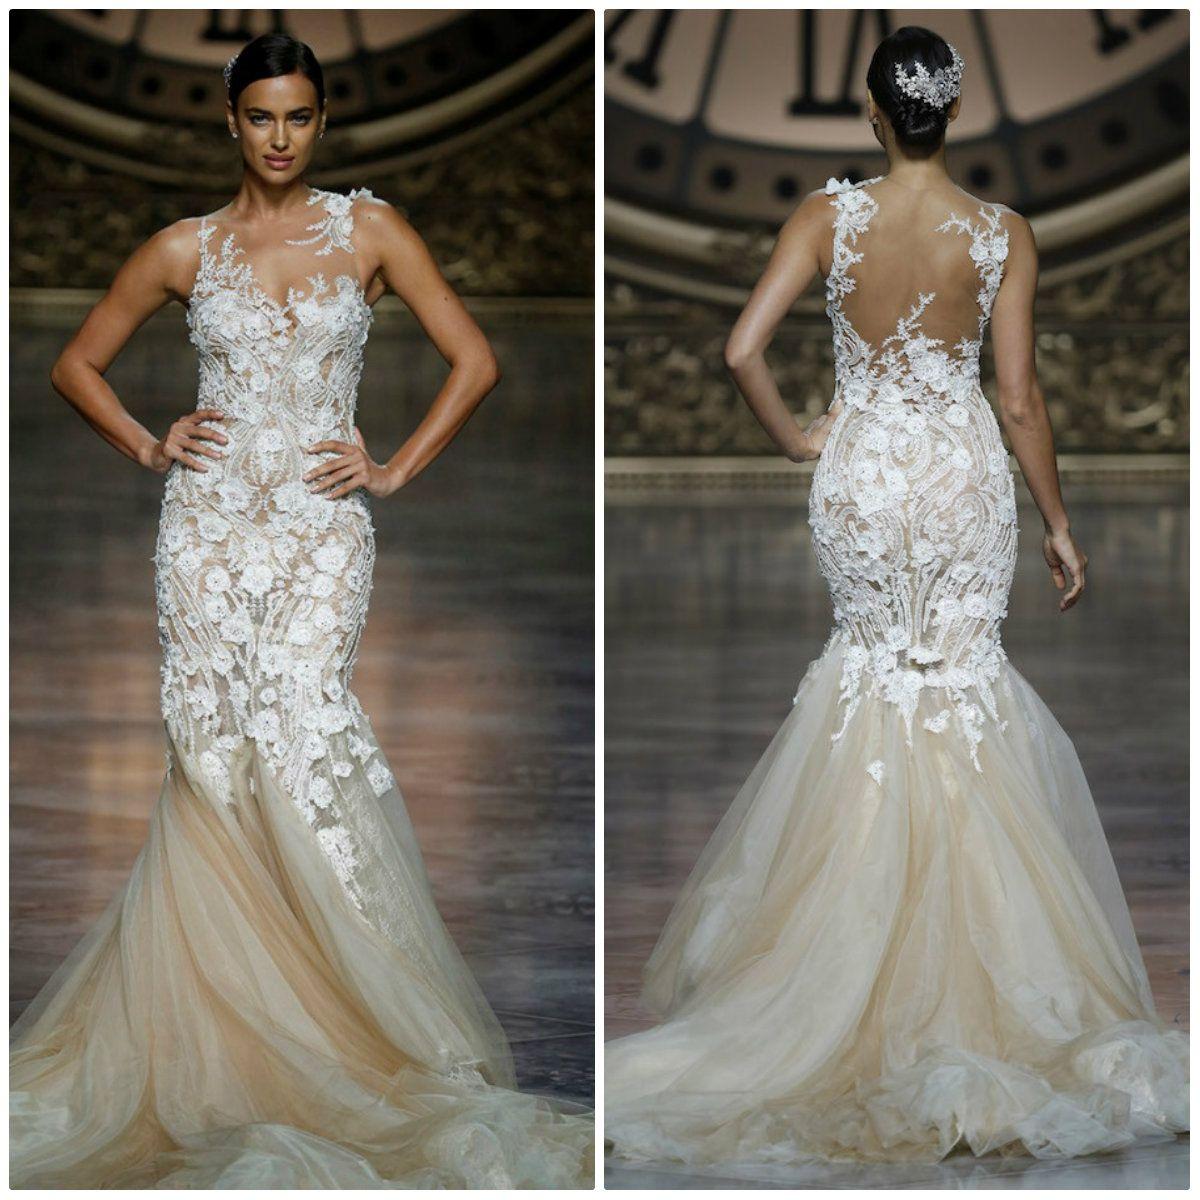 Kandi burruss wedding dress  stefanie stefanie on Pinterest